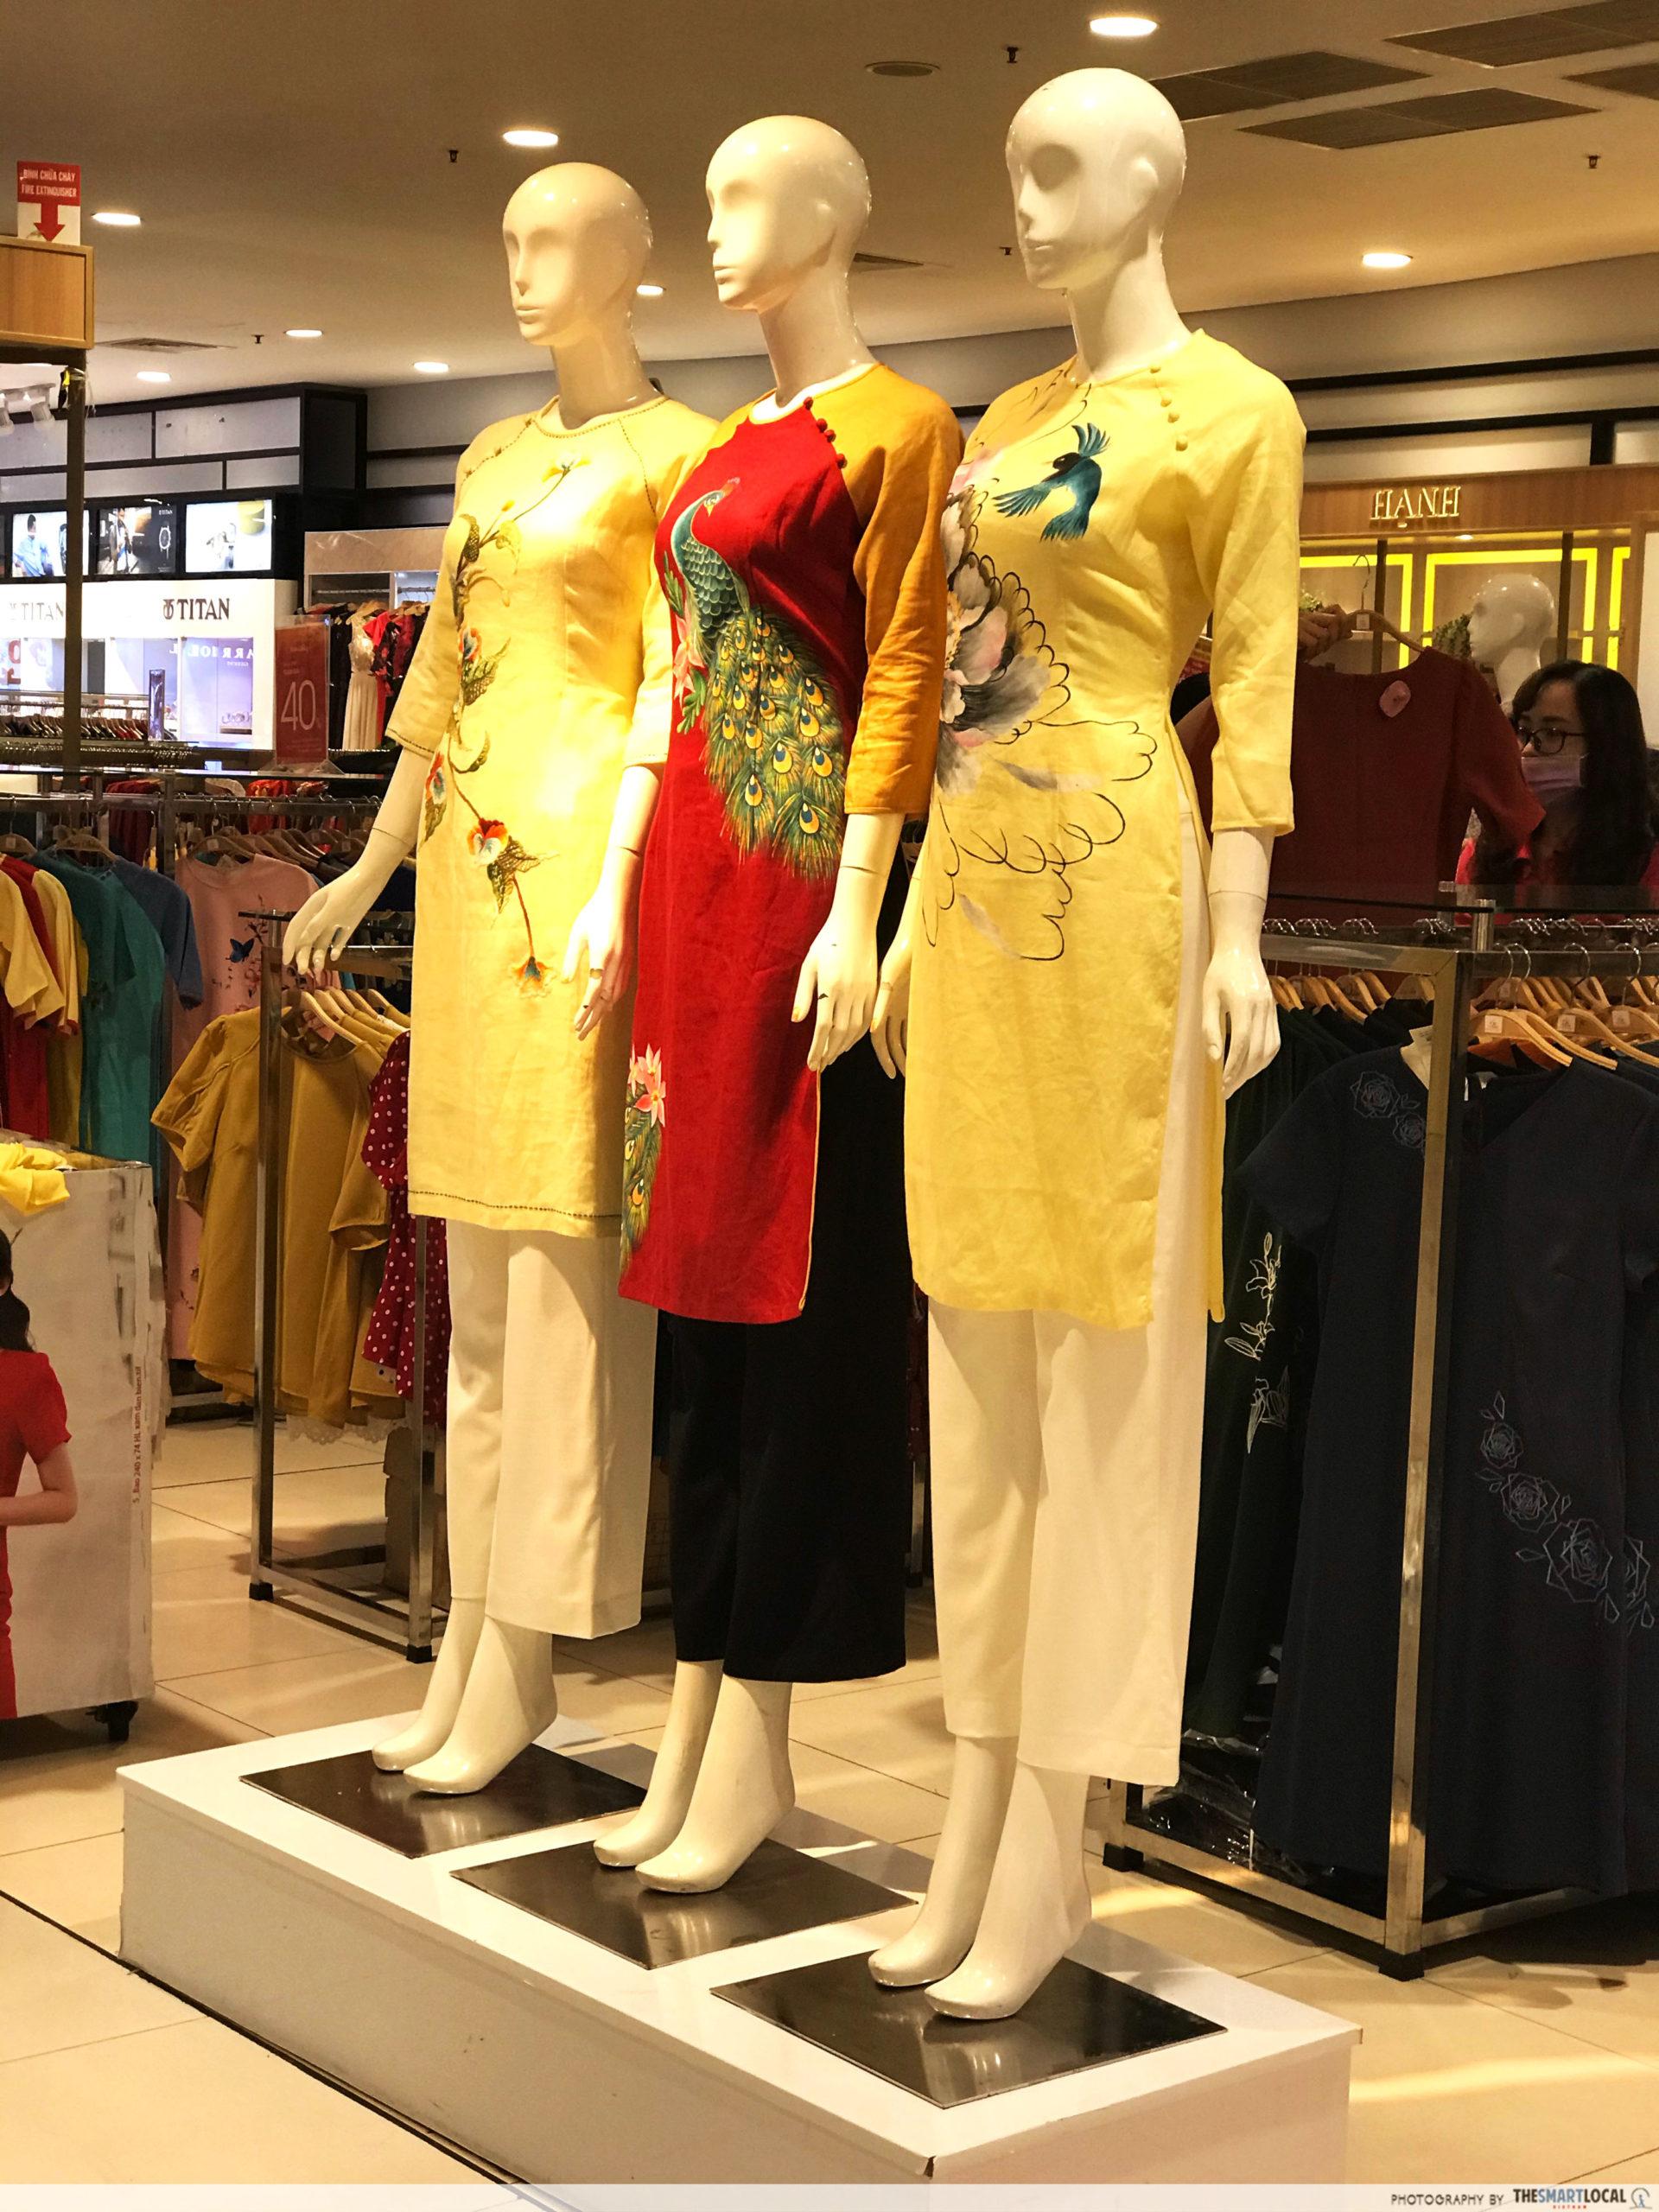 Aeon Mall Dan Chau Clothing